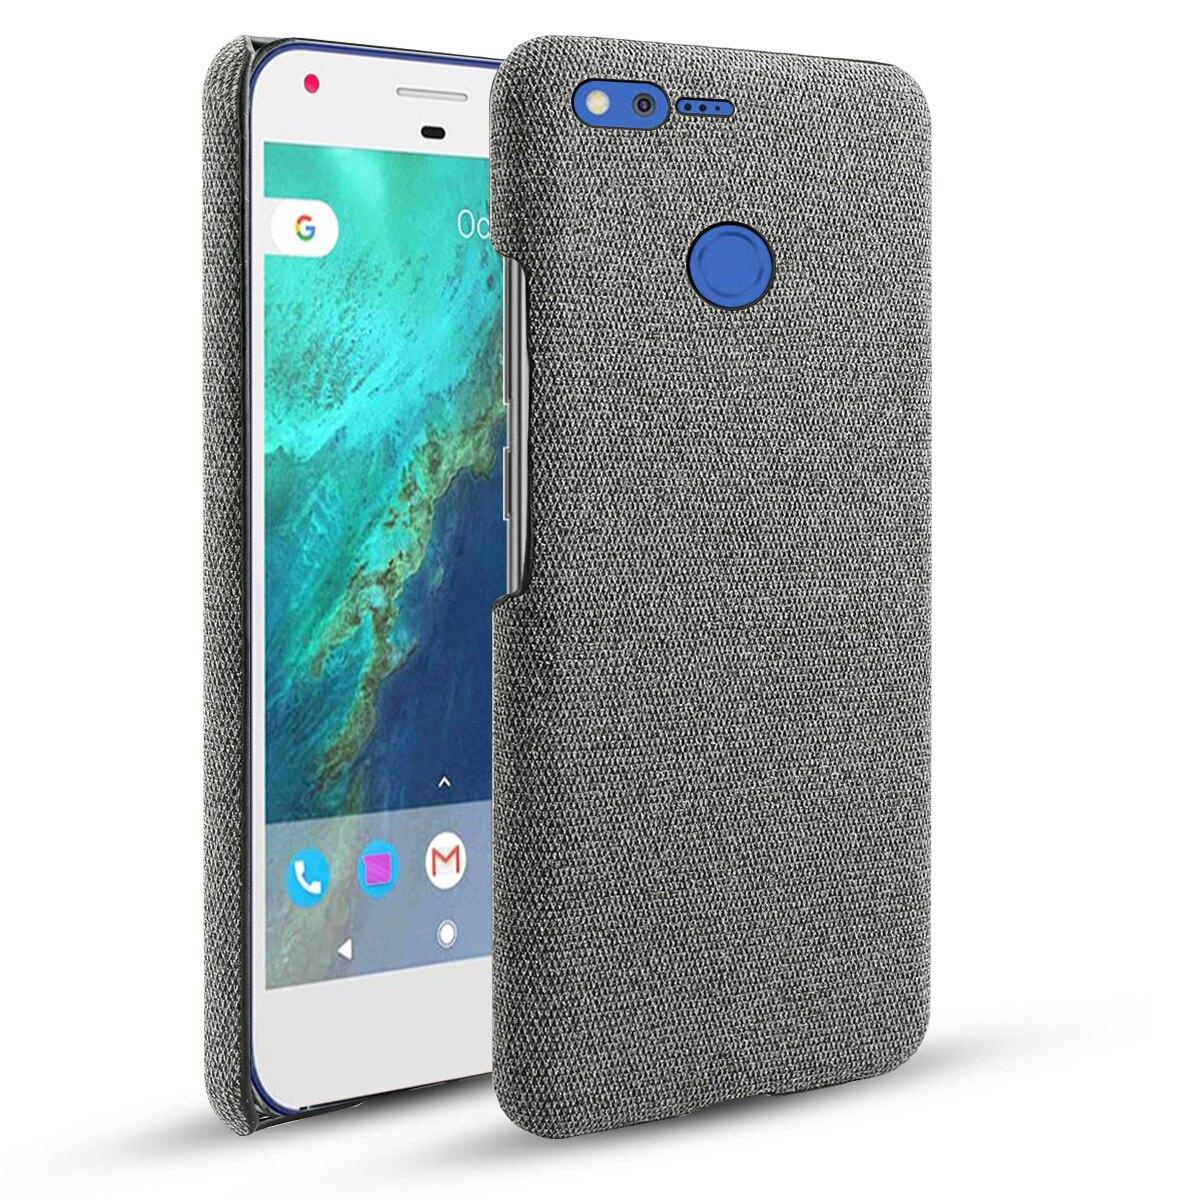 For Google Pixel/Pixel XL Case Retro Woven Fabric Cloth Slim Anti-Scratch Hard PC Cover For Google Pixel XL 2 2 XL 3 3A 4 Case